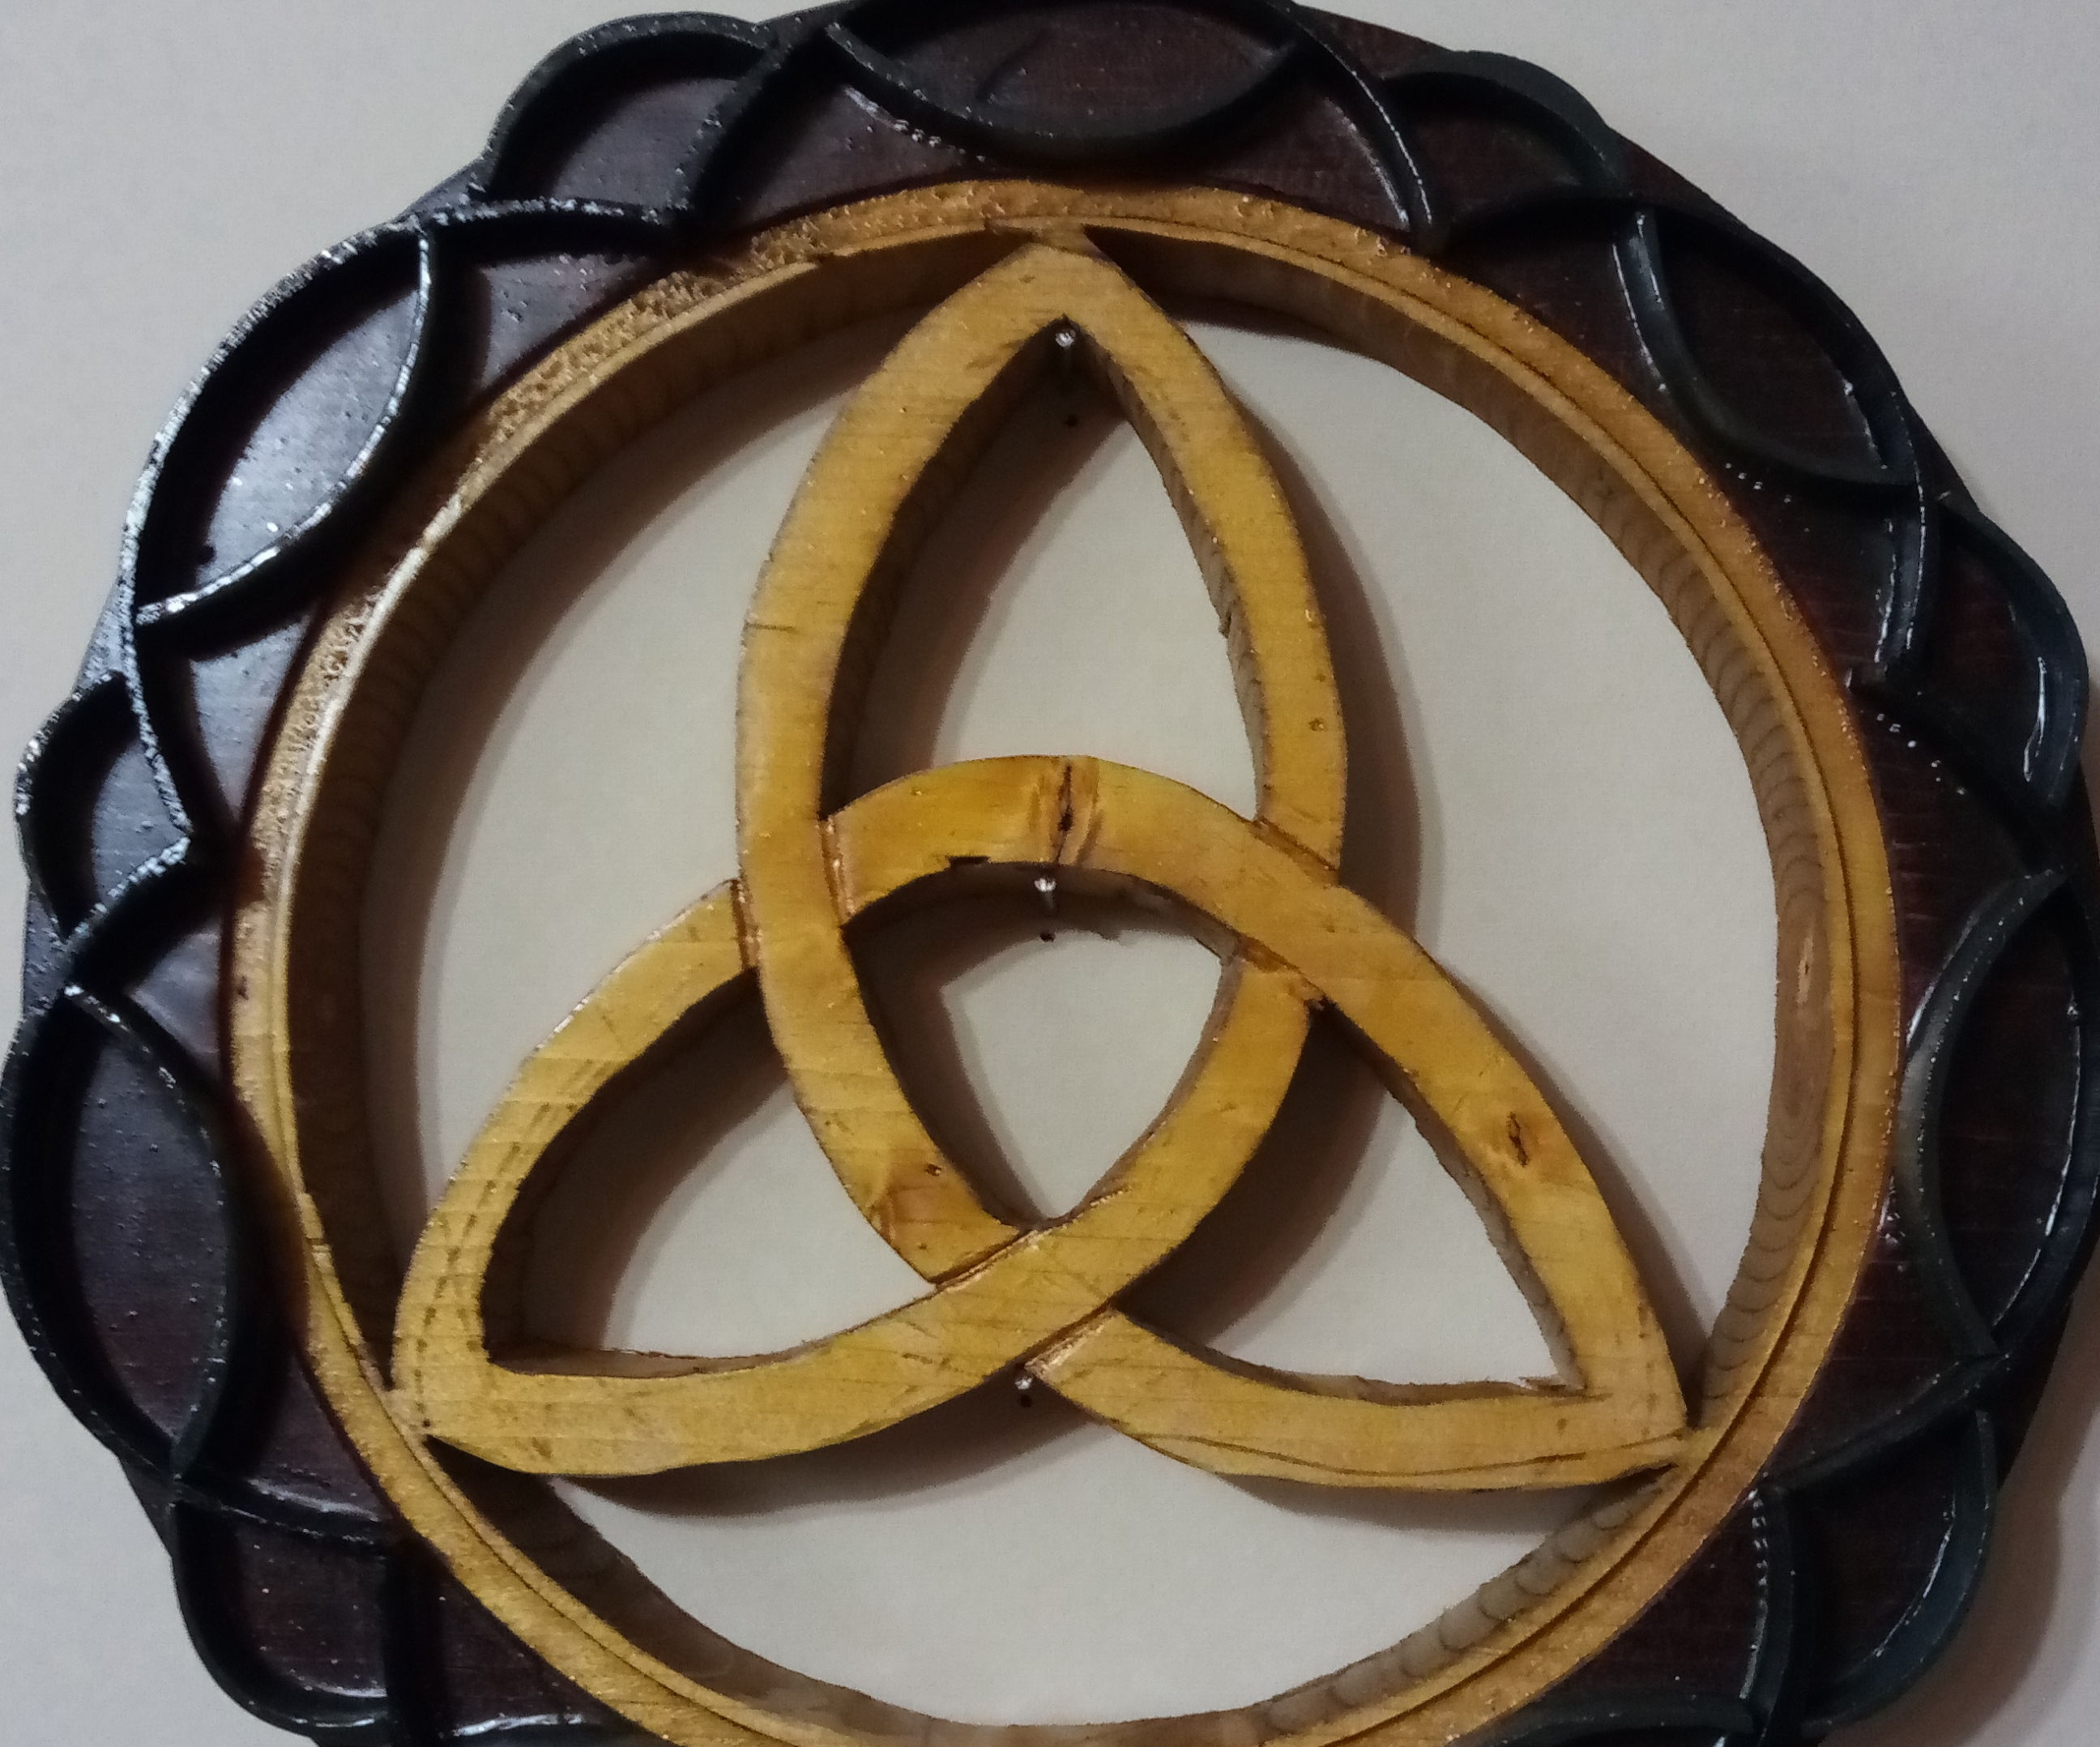 Celtic Knot With Trinity Symbol